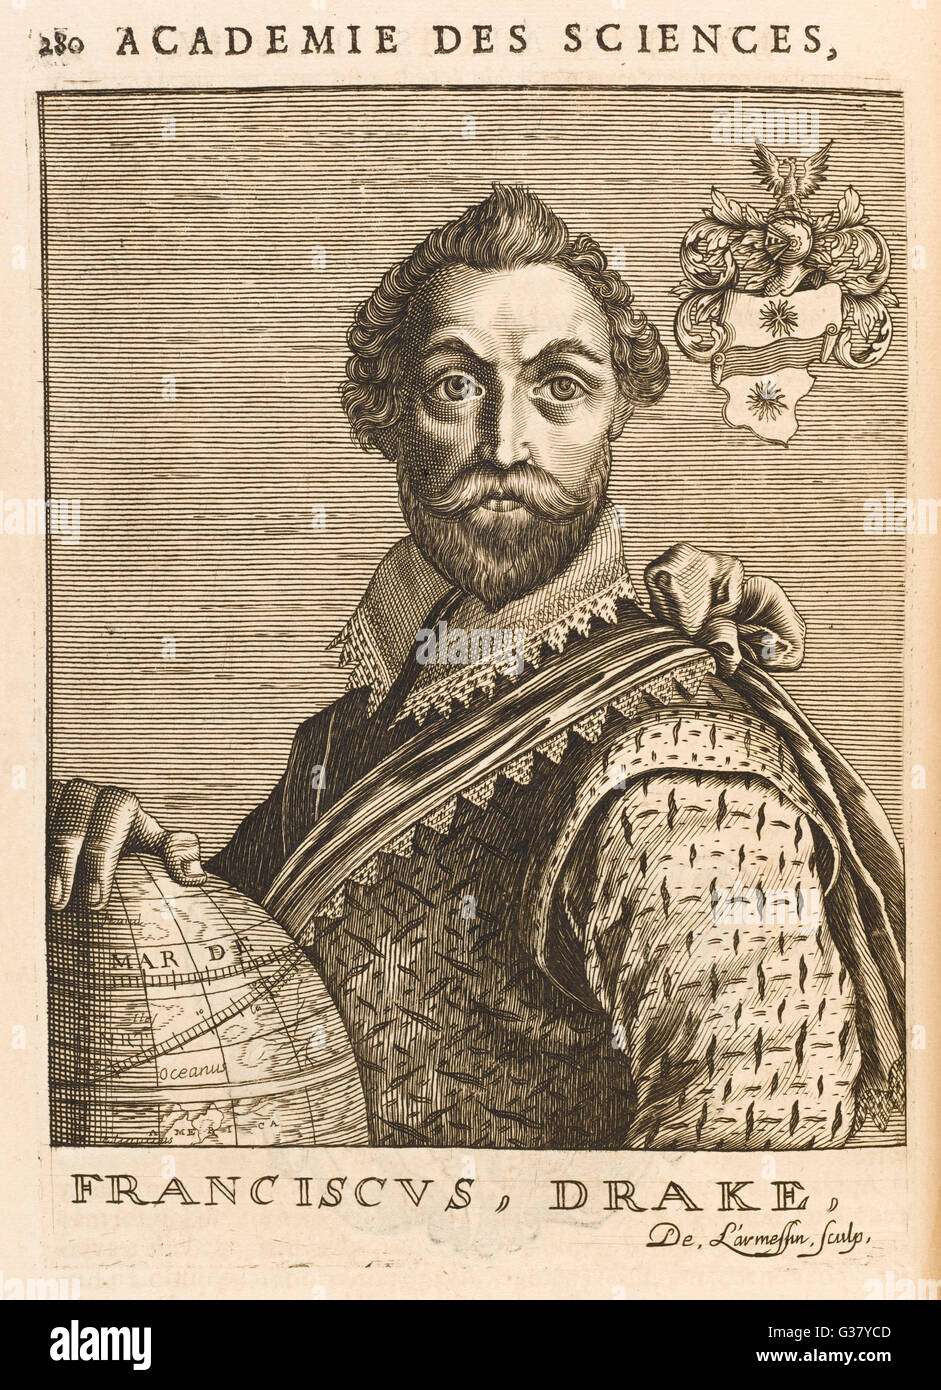 Sir Francis Drake(1545-1596), English Admiral. - Stock Image